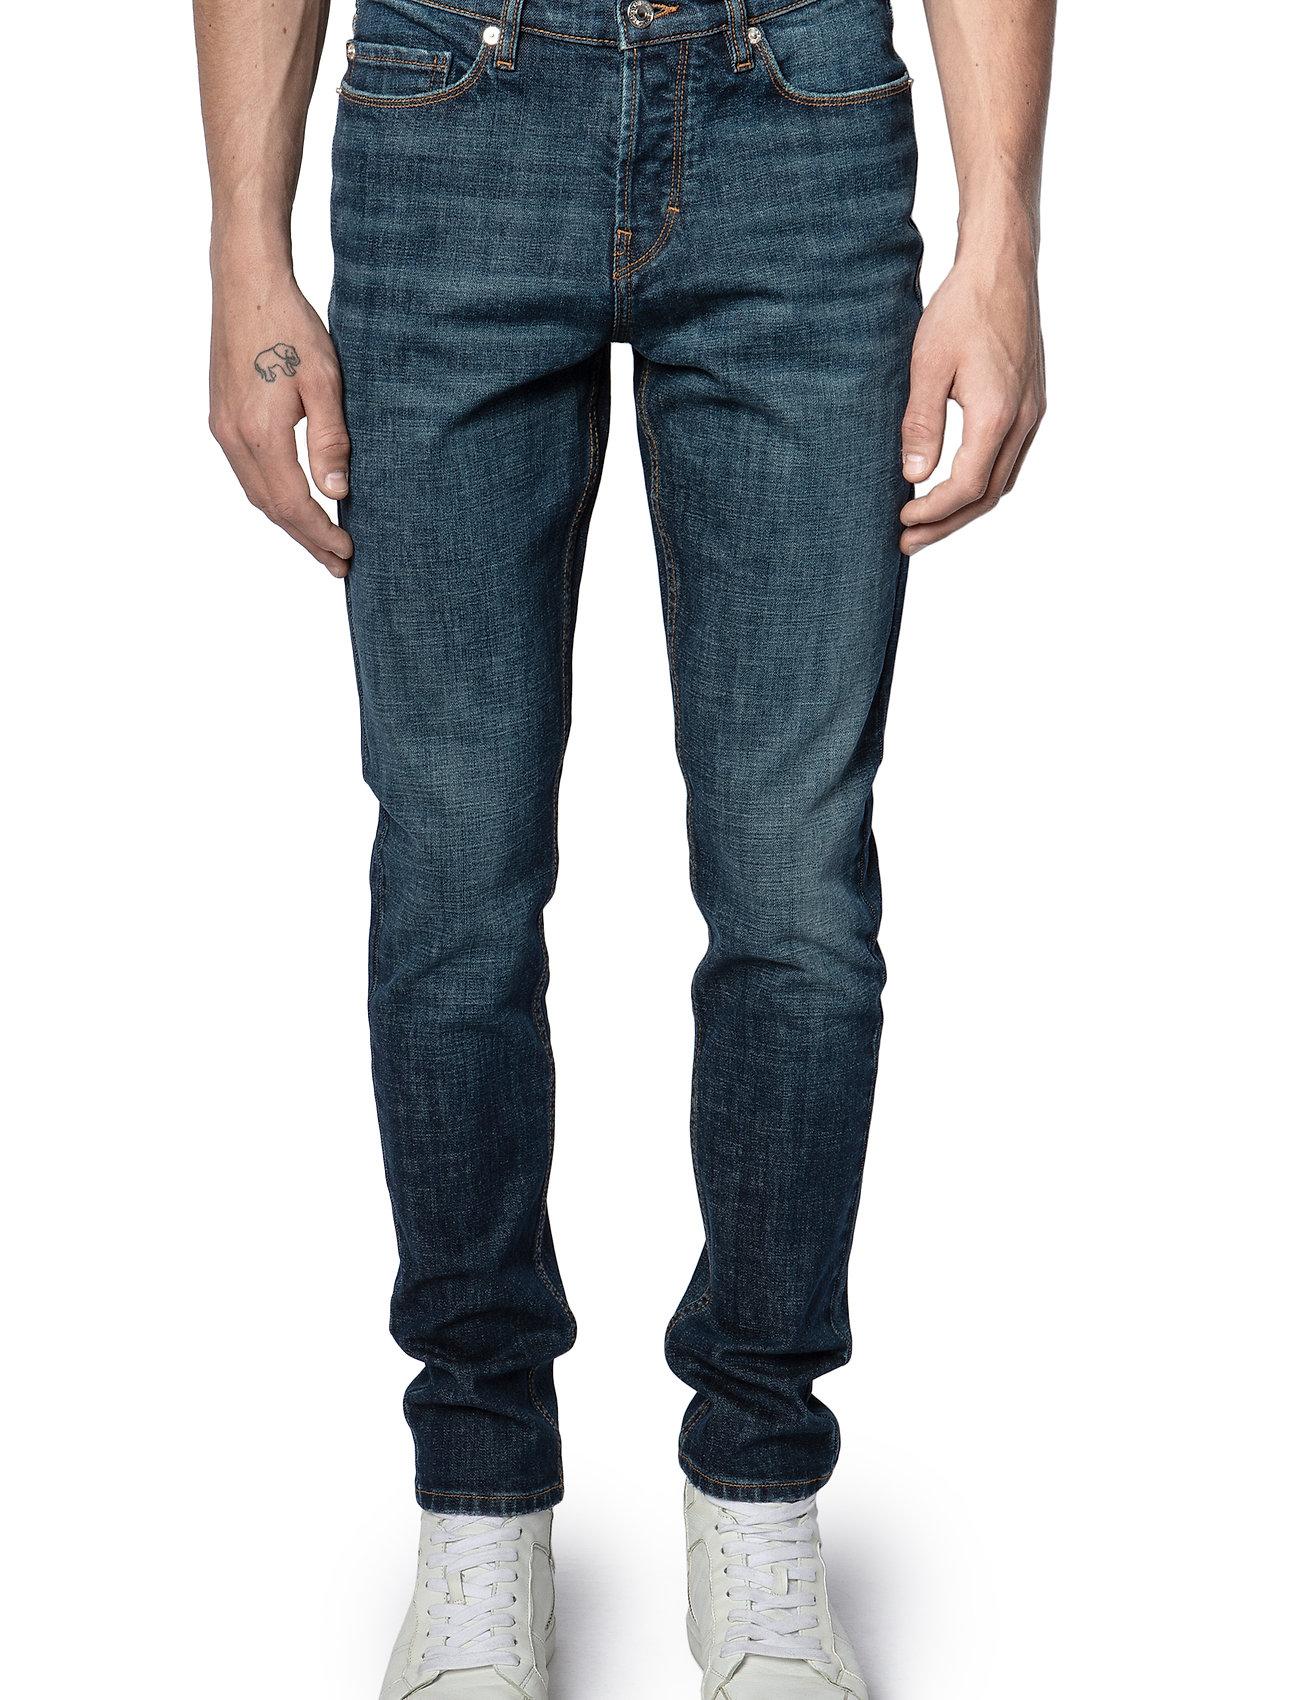 Zadig & Voltaire - DAVID ECO OLD BRUT - slim jeans - blue - 0